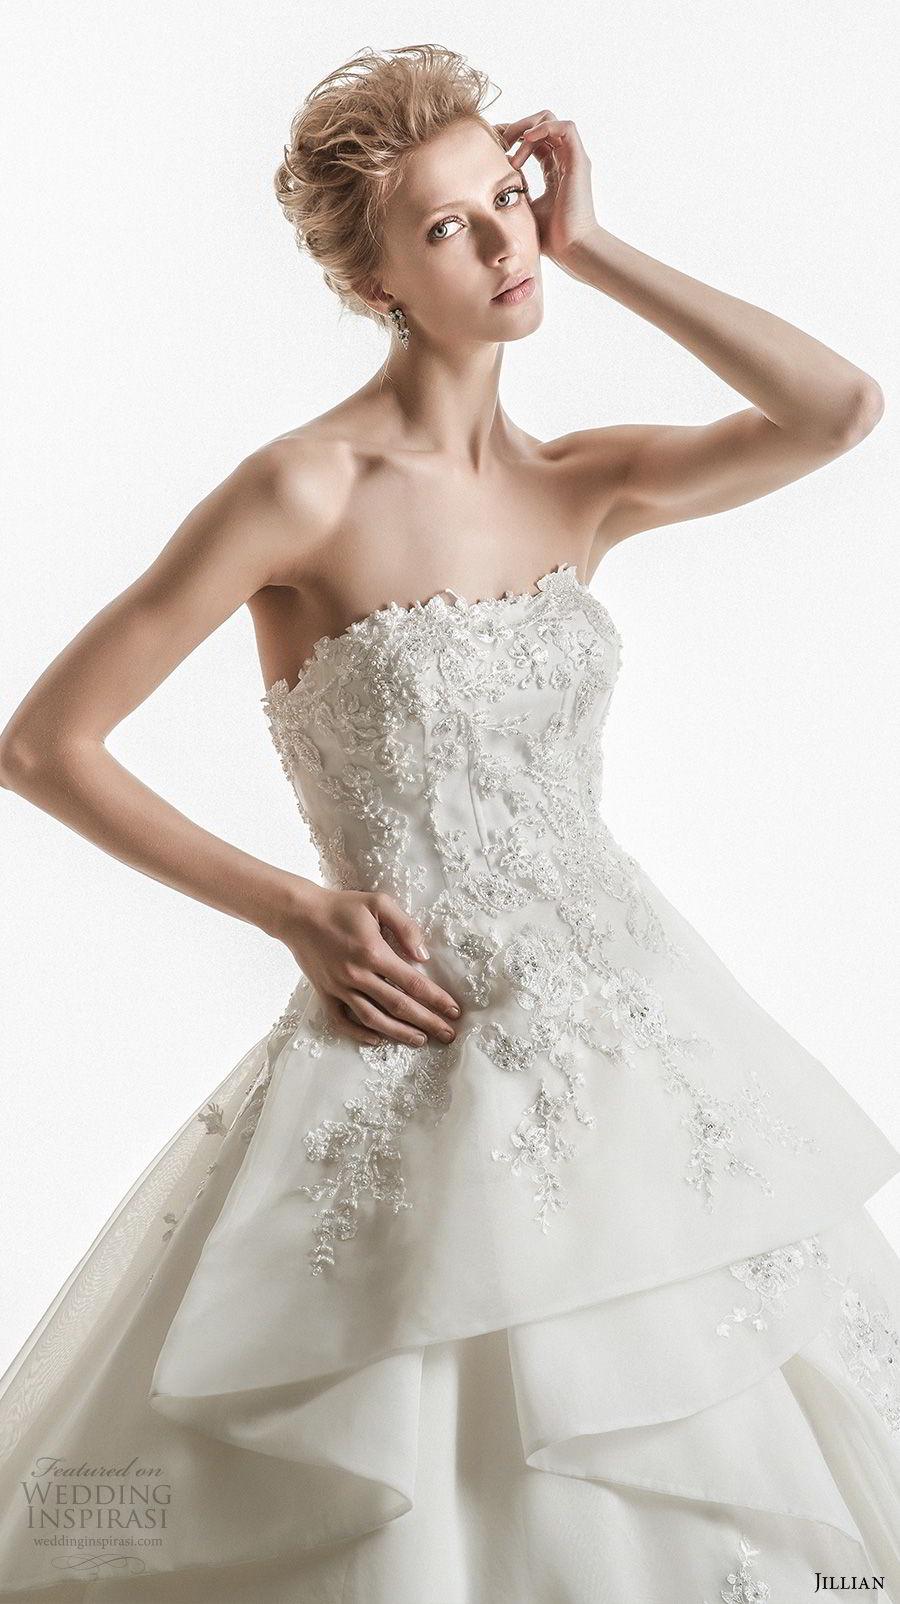 jillian 2018 bridal strapless straight across neckline heavily embellished bodice peplum princess ball gown wedding dress royal train (18) zv